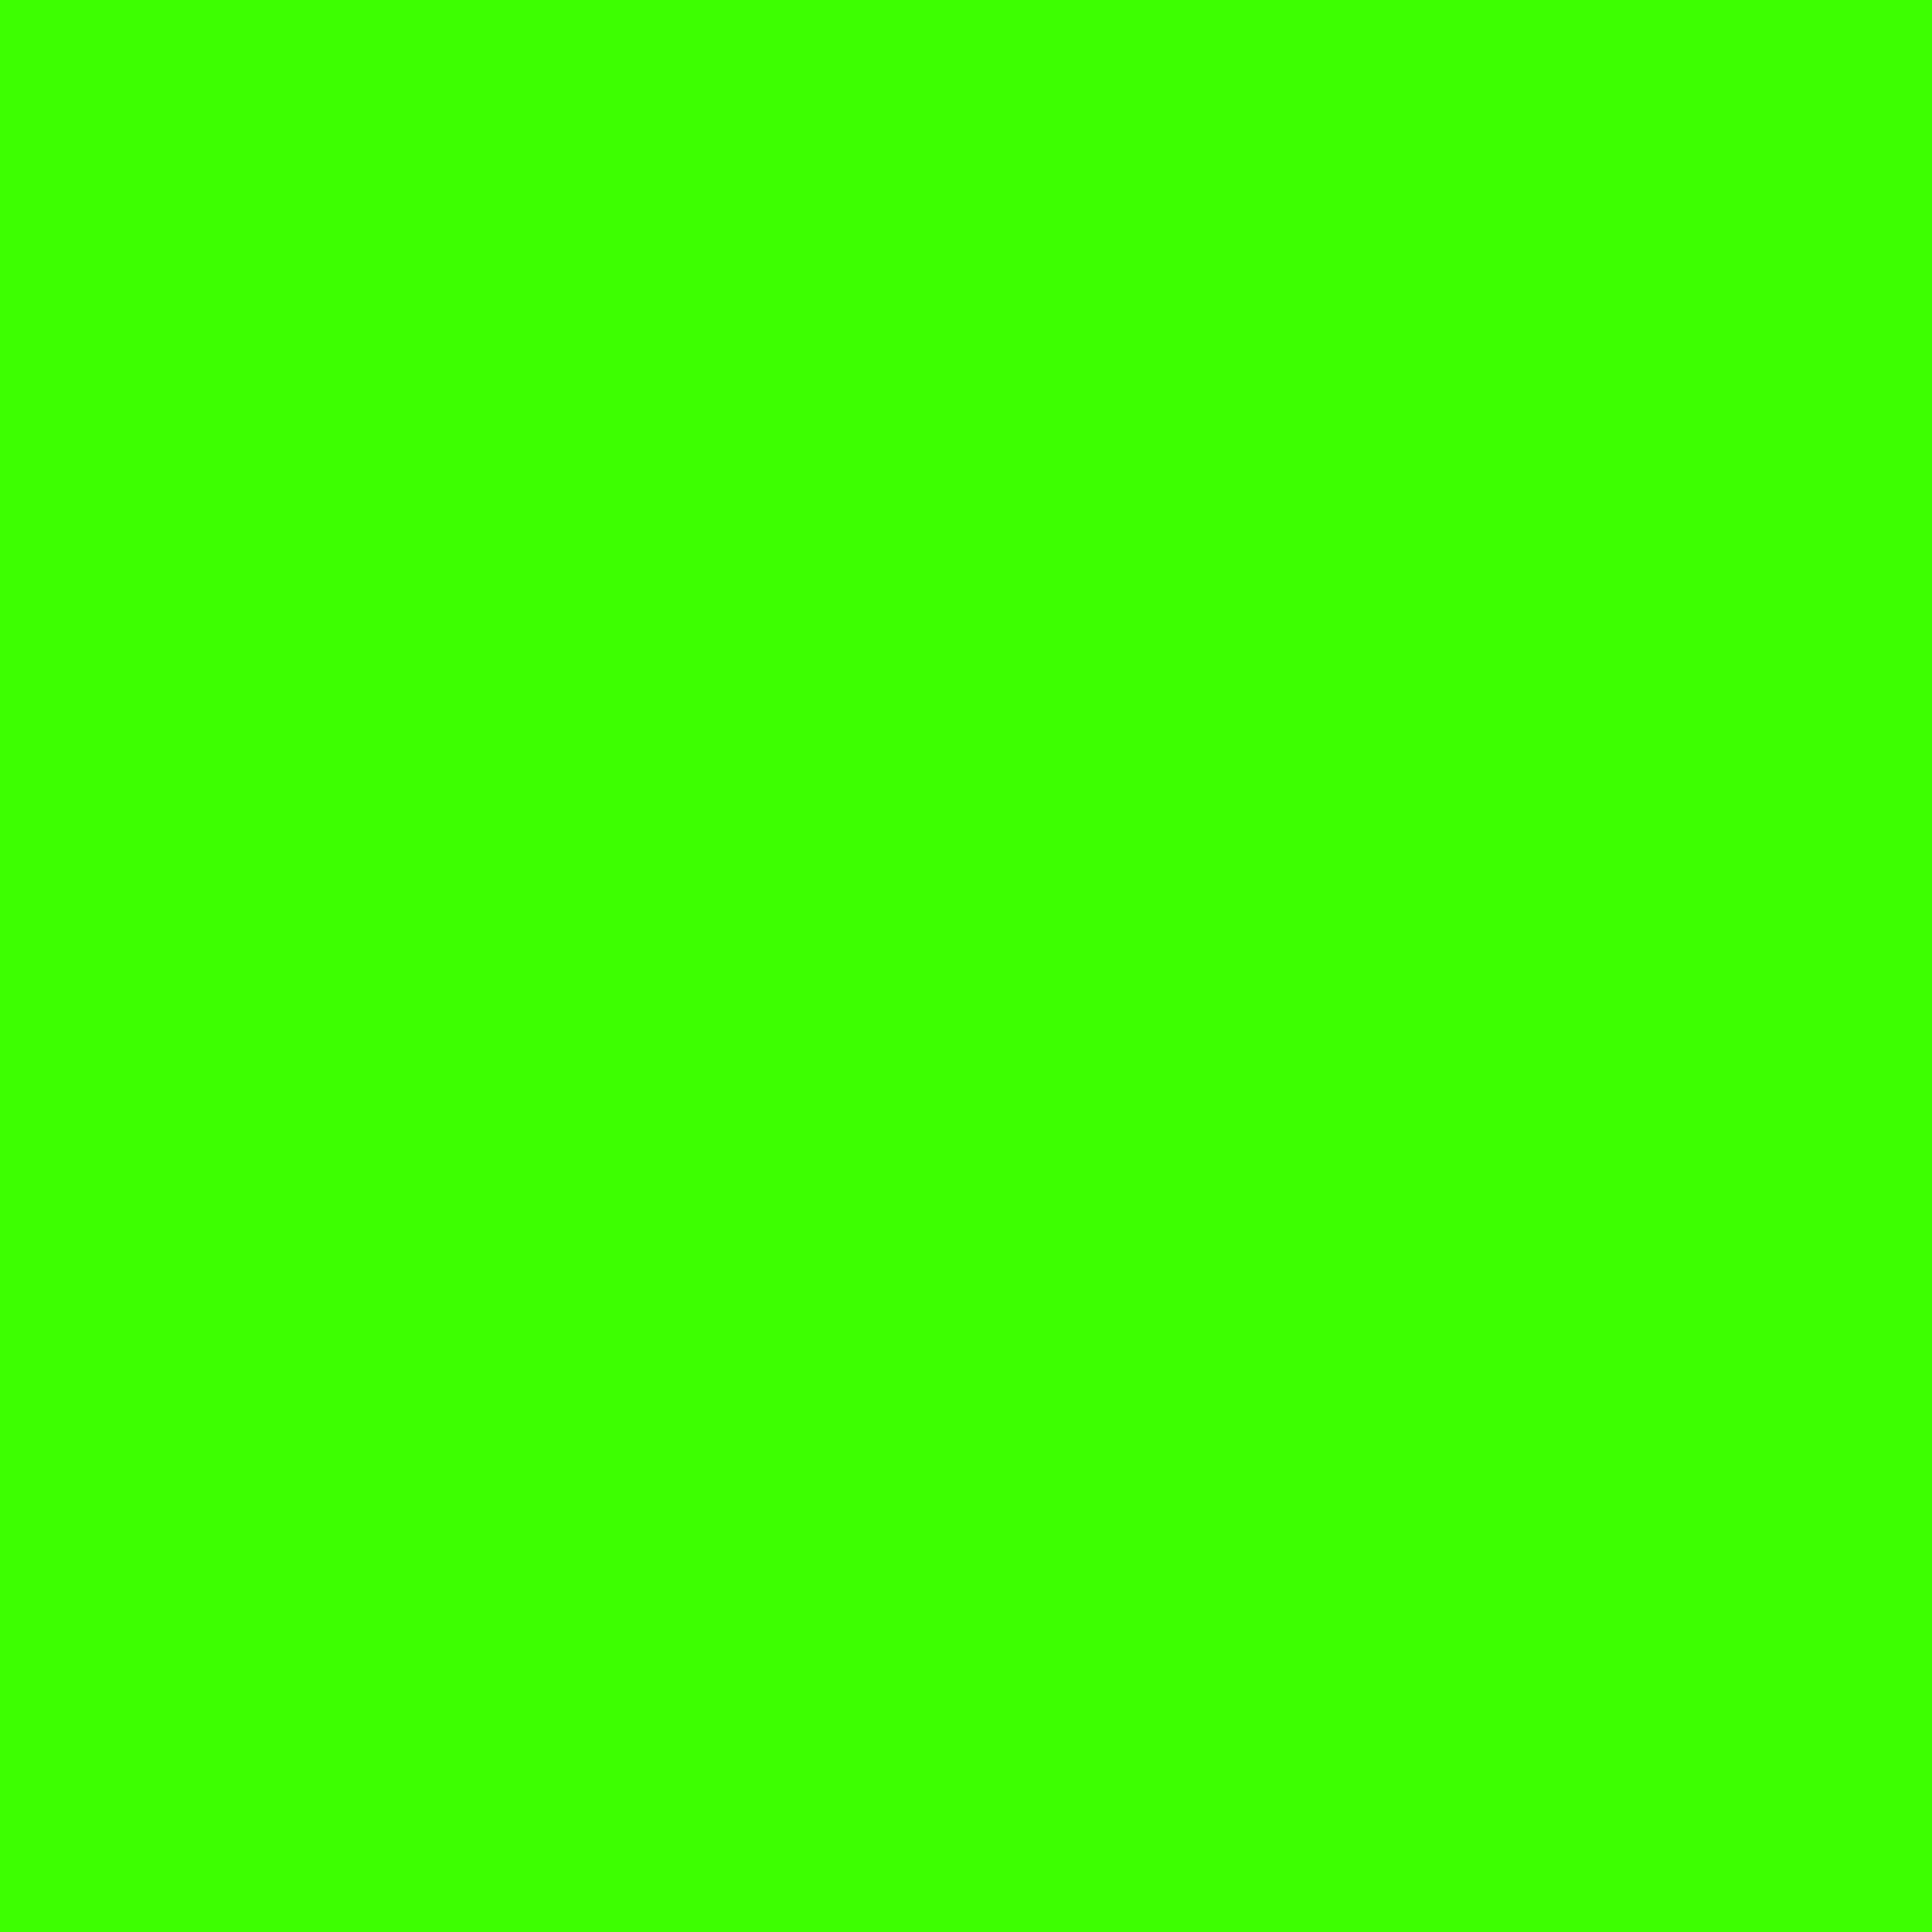 2048x2048 Harlequin Solid Color Background